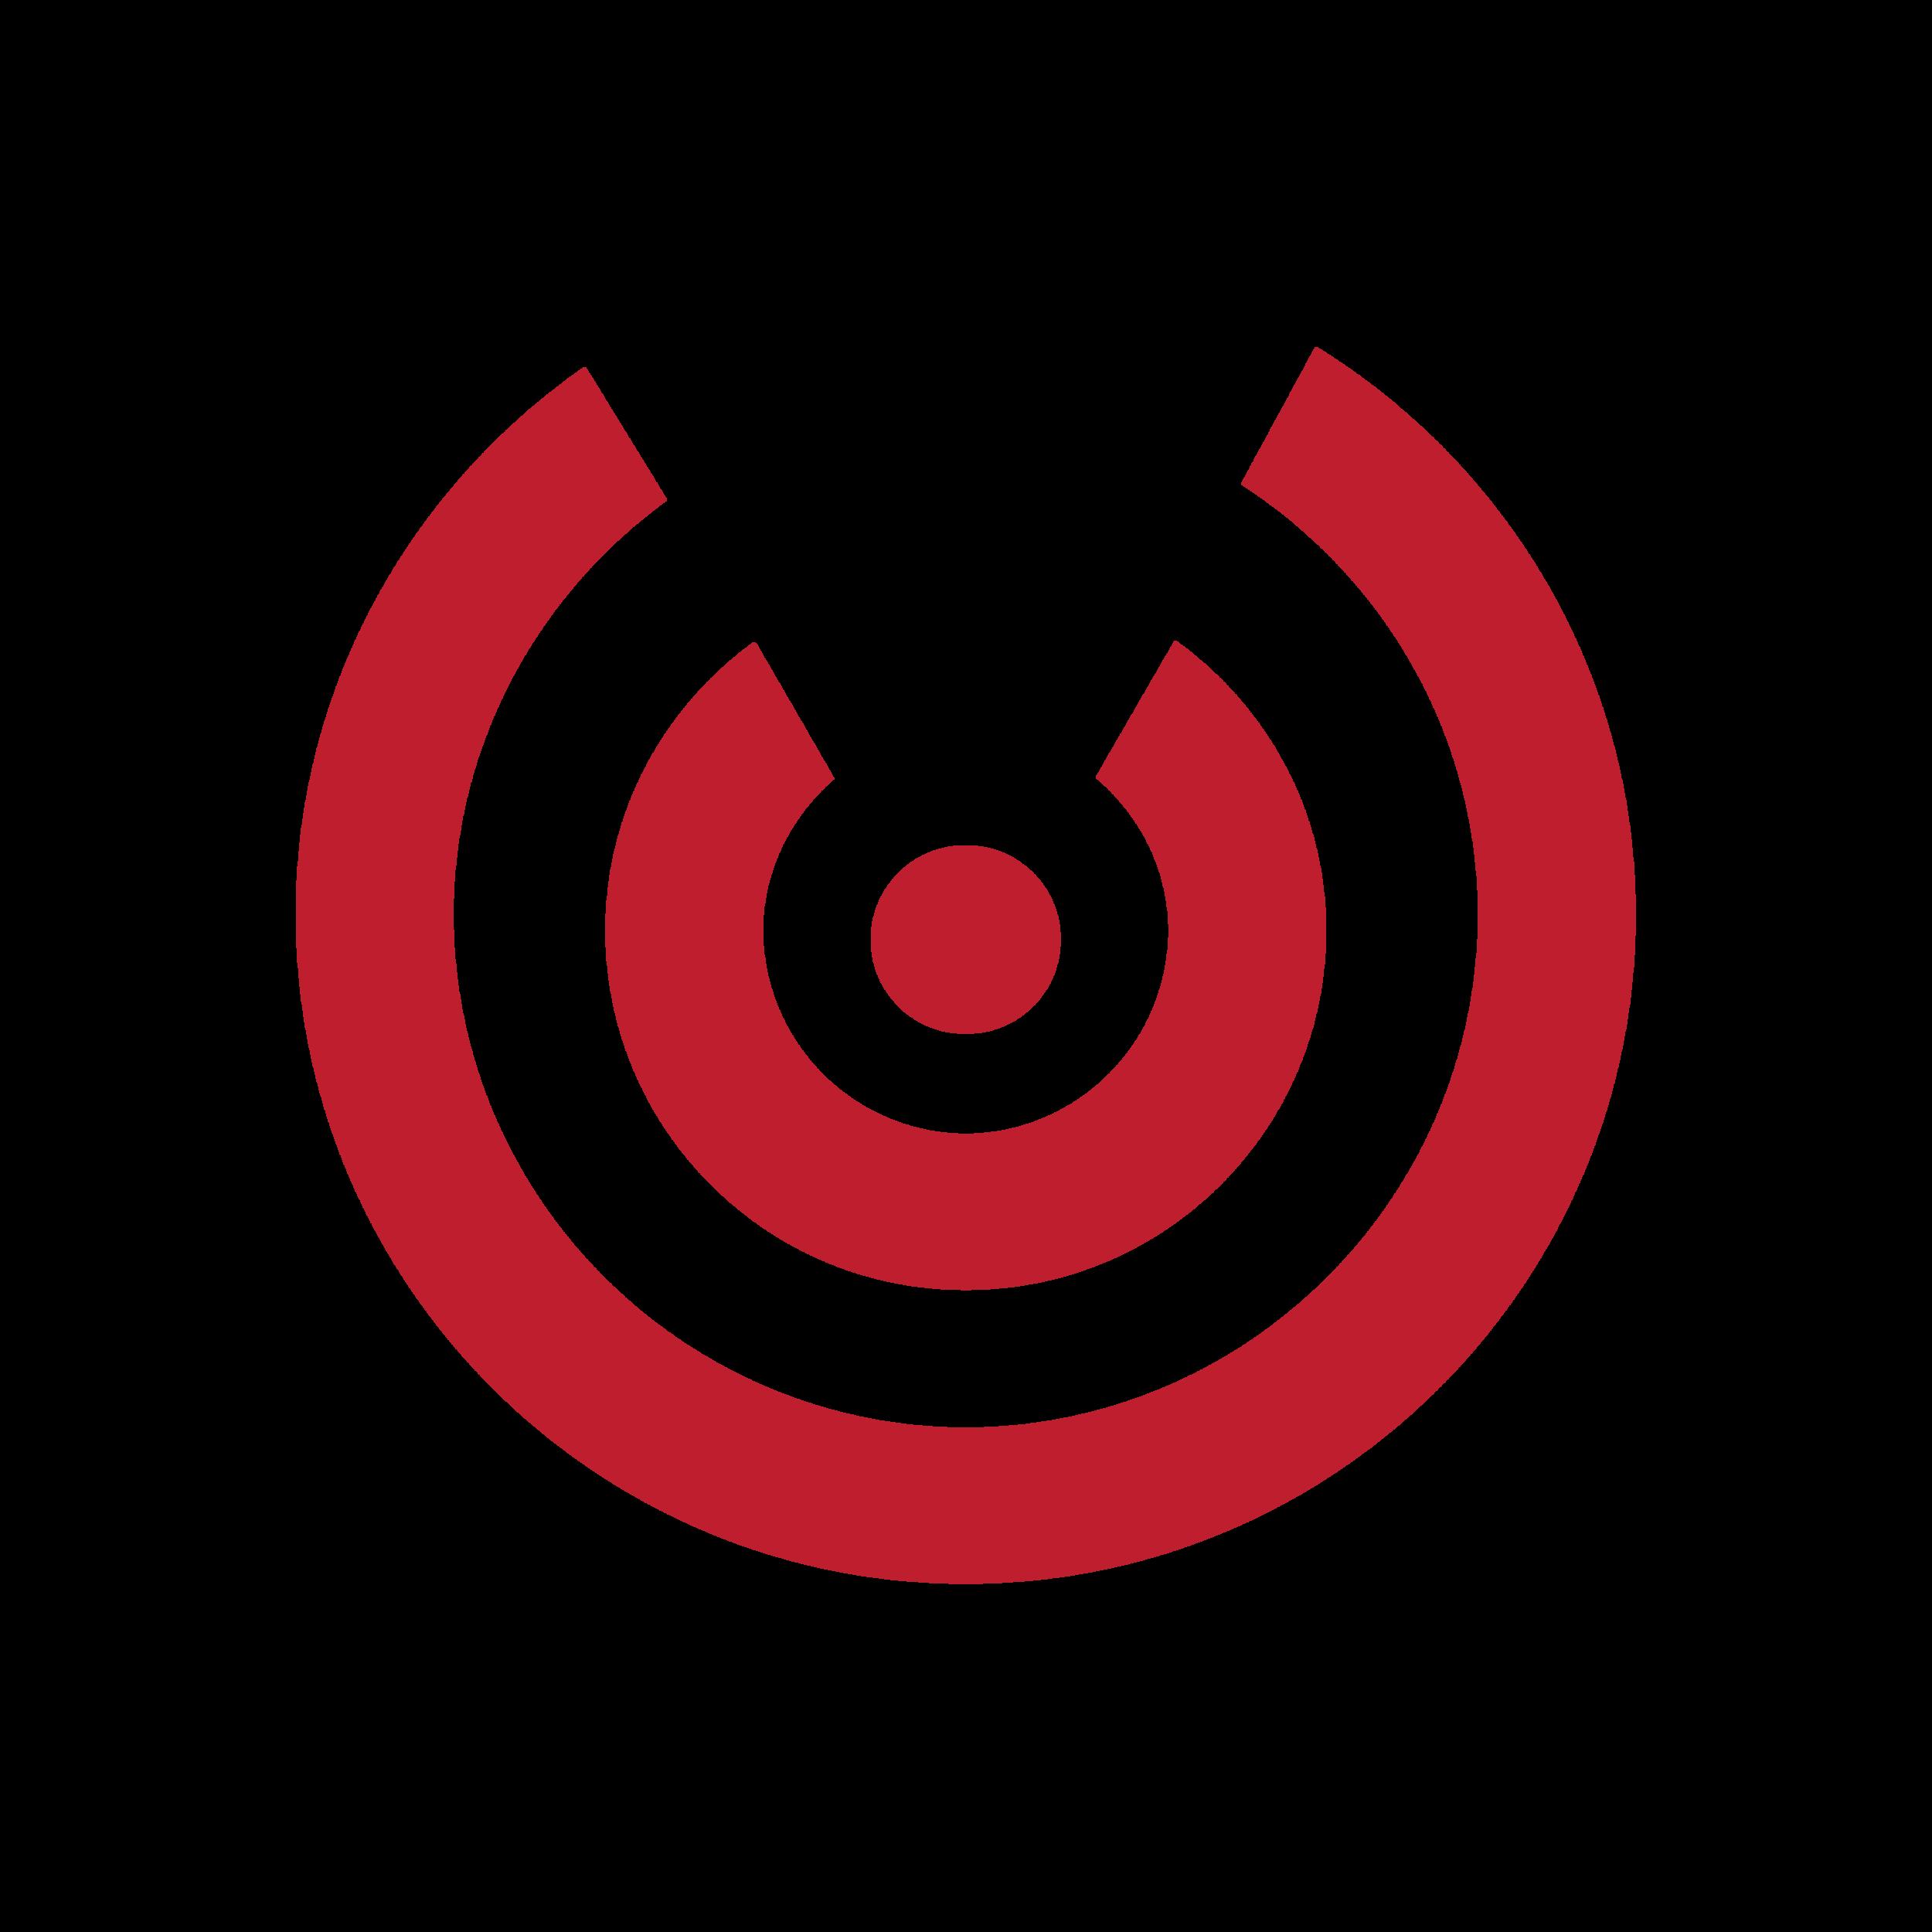 Vision-Bot-Target-Square.png